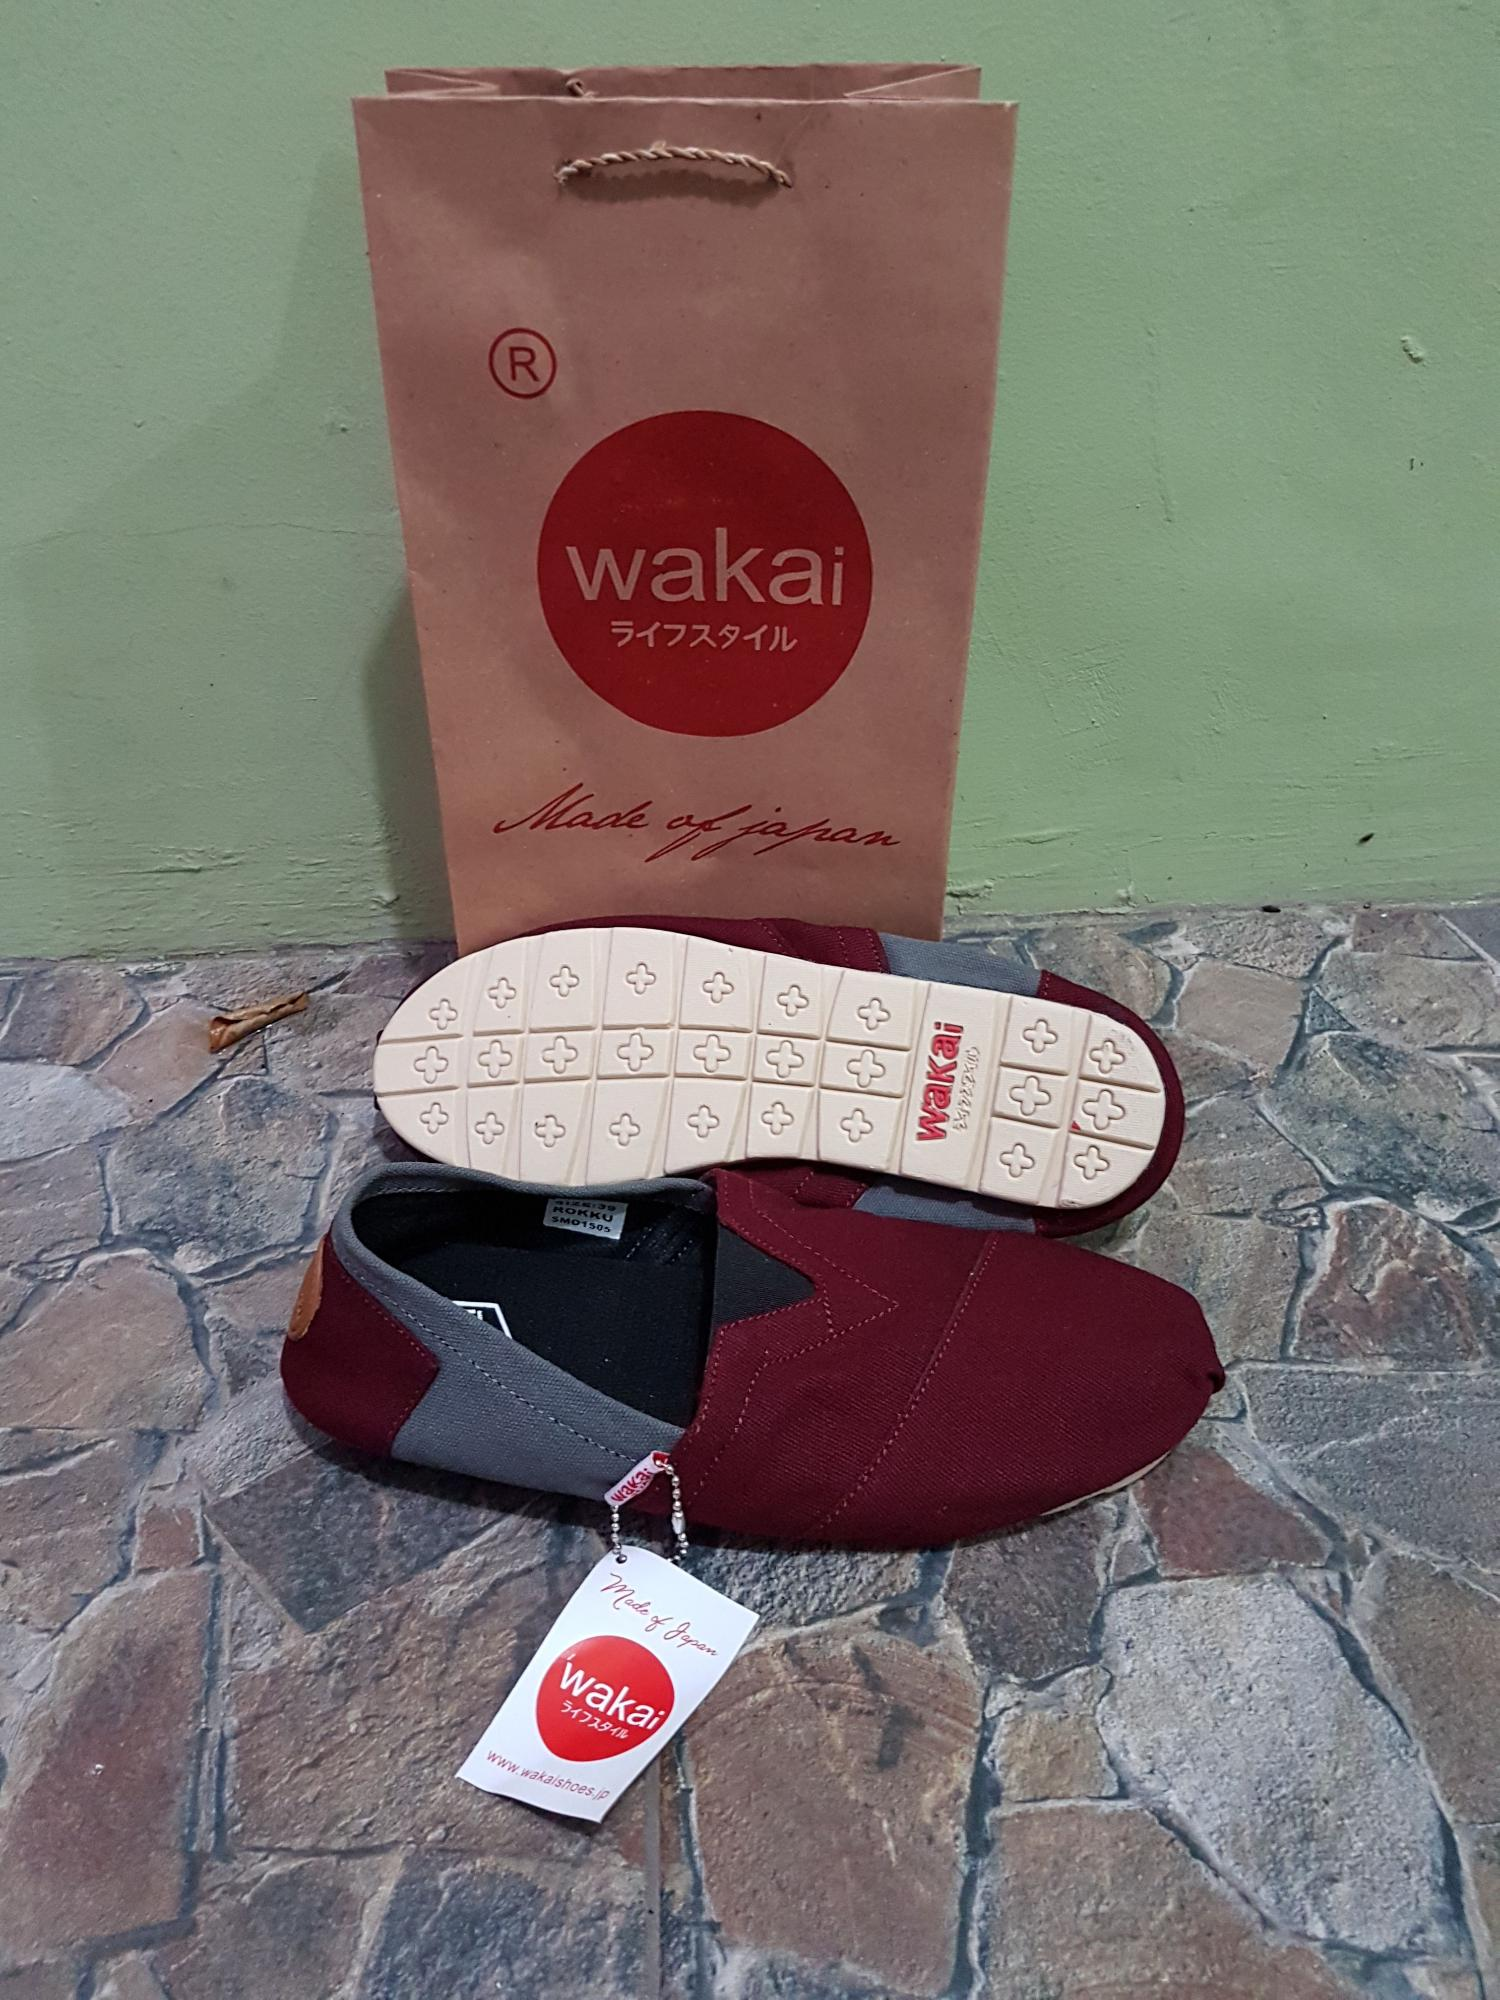 Toko Indonesia Perbandingan Harga Sepatu Wanita Shoes Box 17 08 18 Wakai Pria Slip On Fashion Spatu Dan Marun Abu